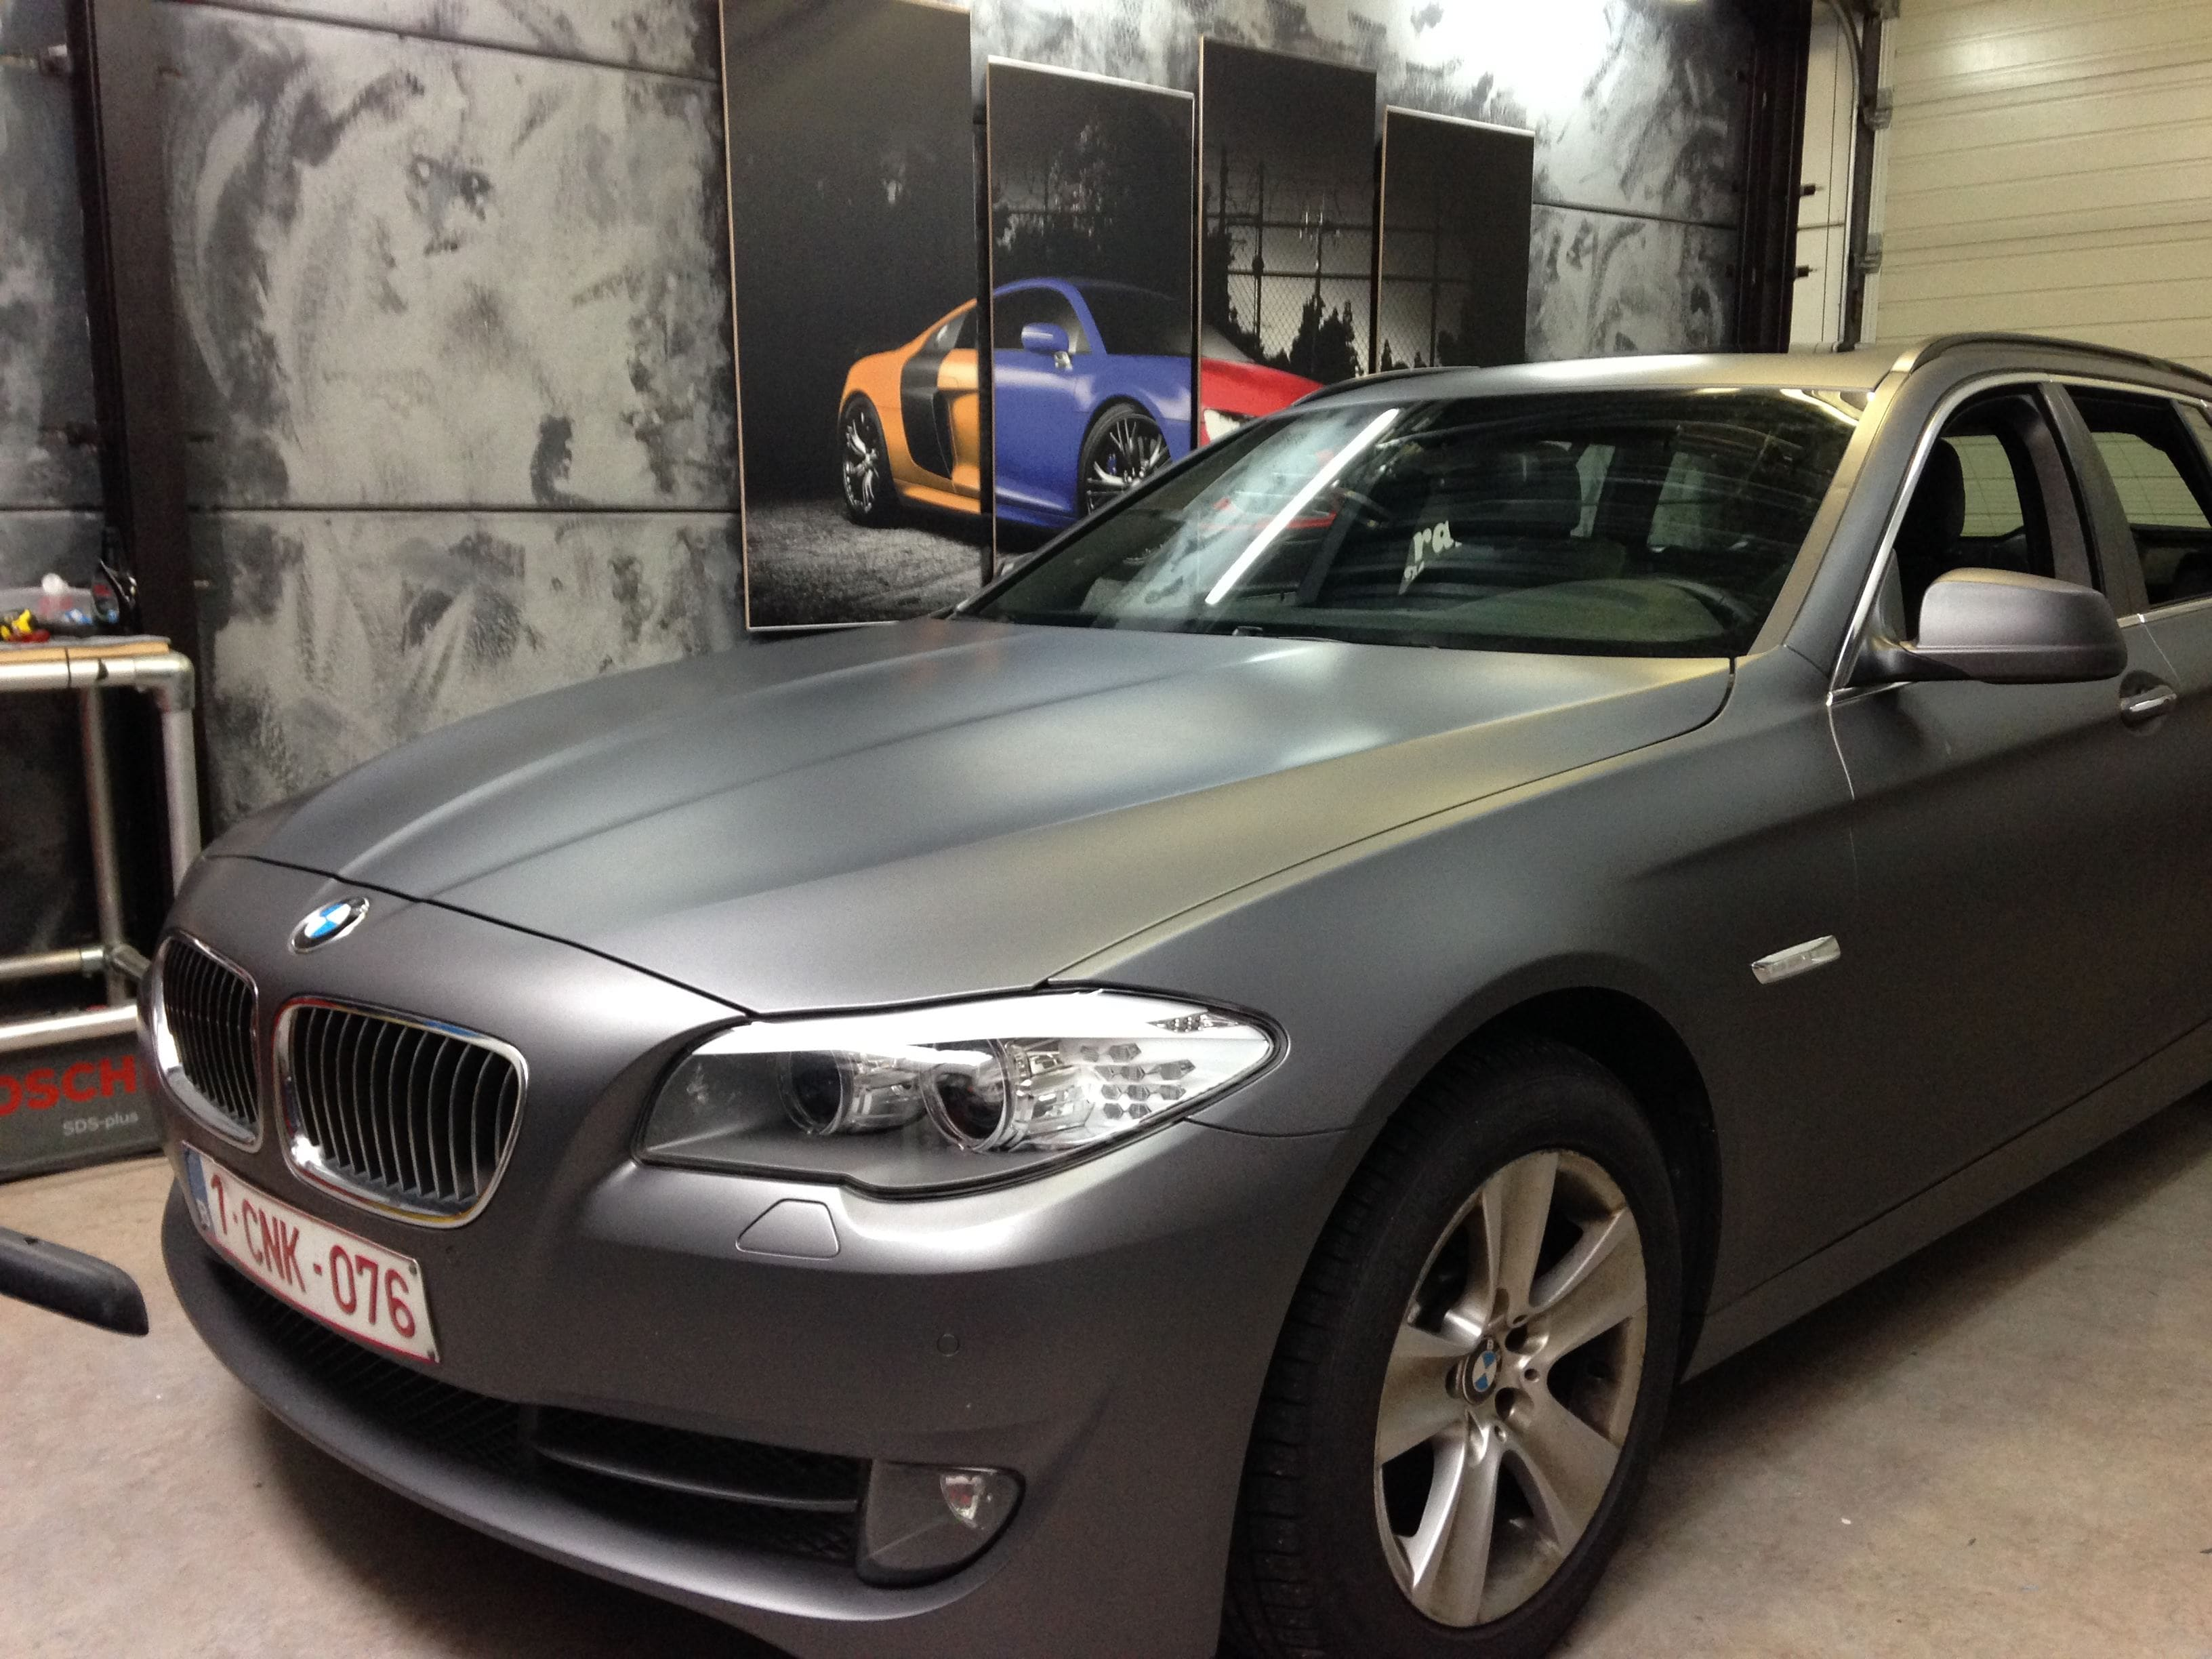 BMW 5 Serie met Gunpowder Wrap, Carwrapping door Wrapmyride.nu Foto-nr:5266, ©2021